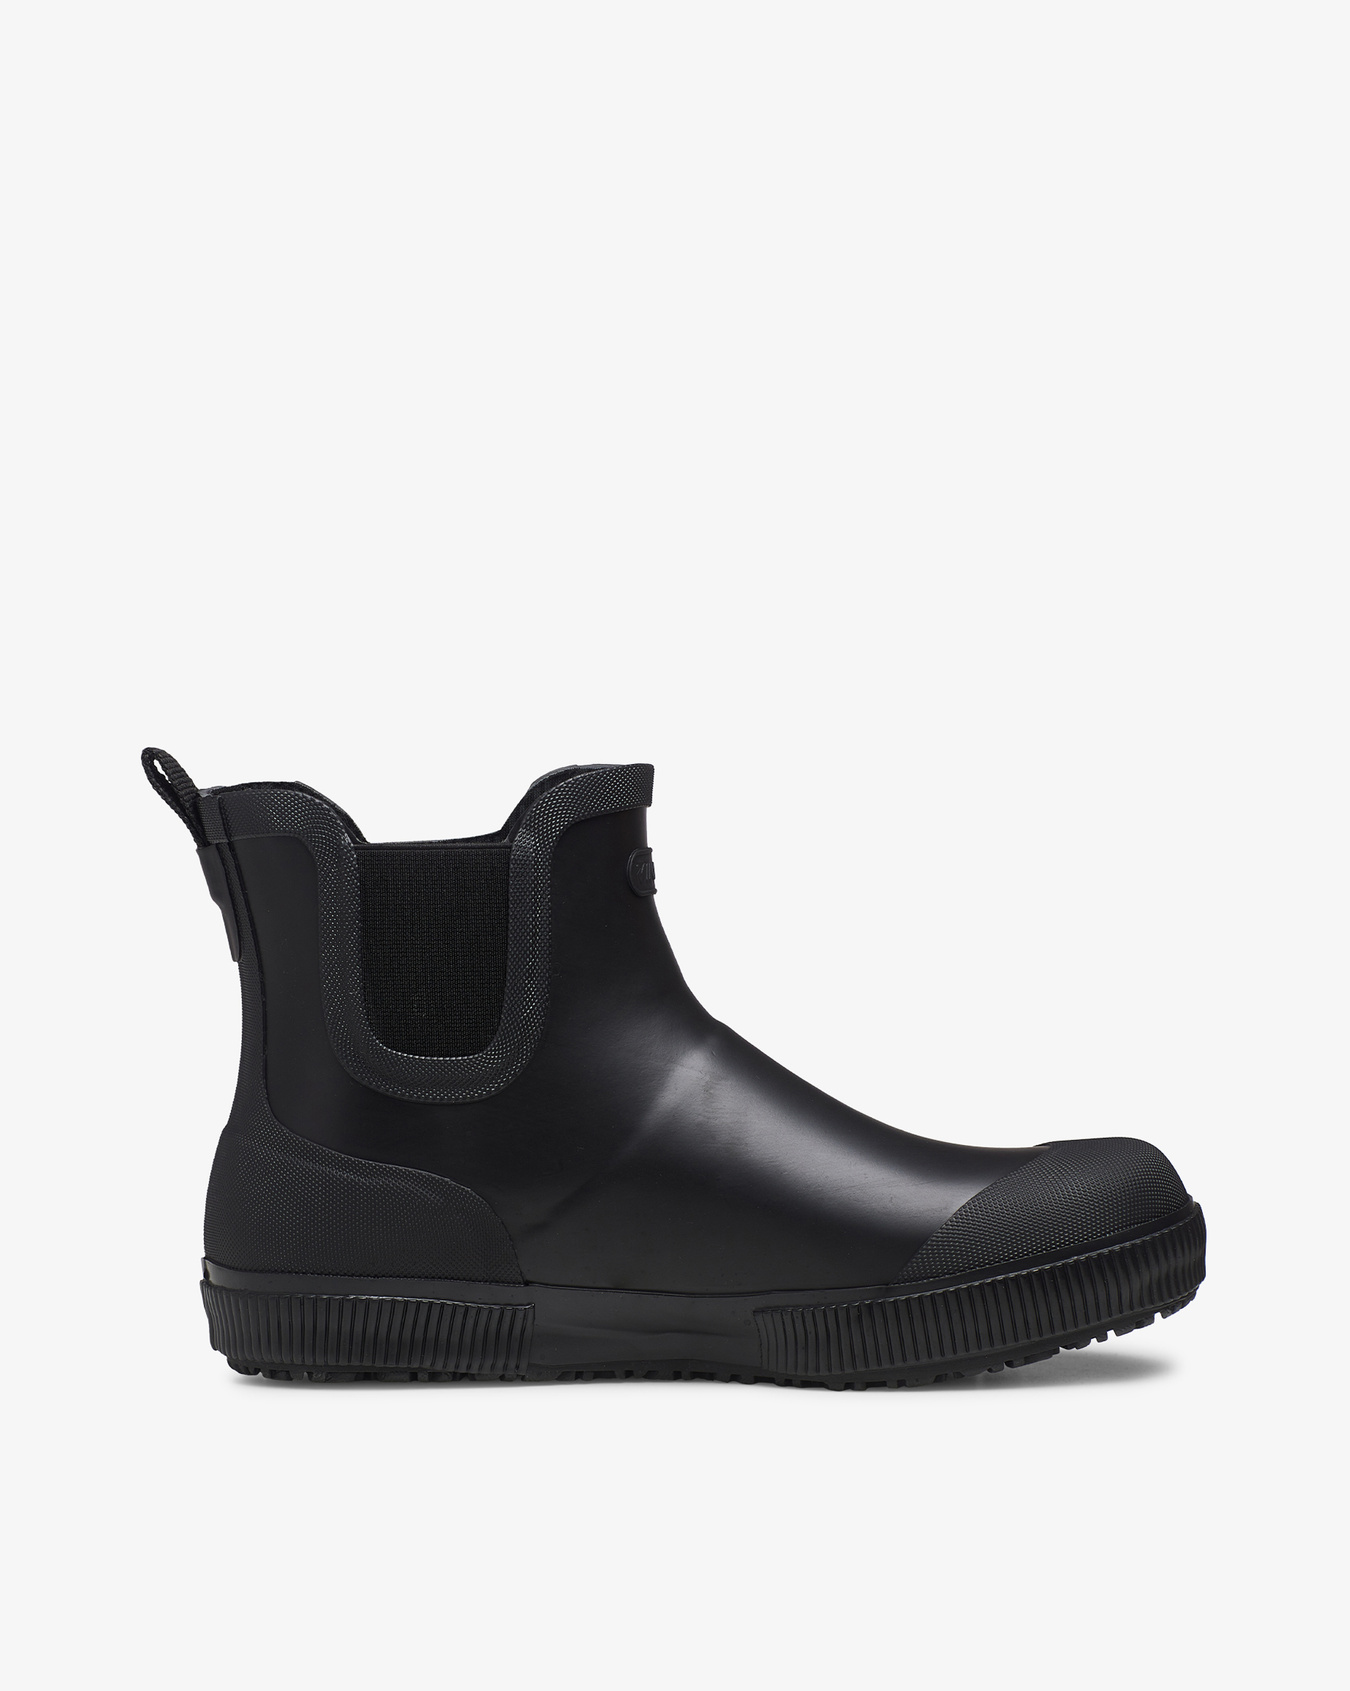 Praise Rubber Boot